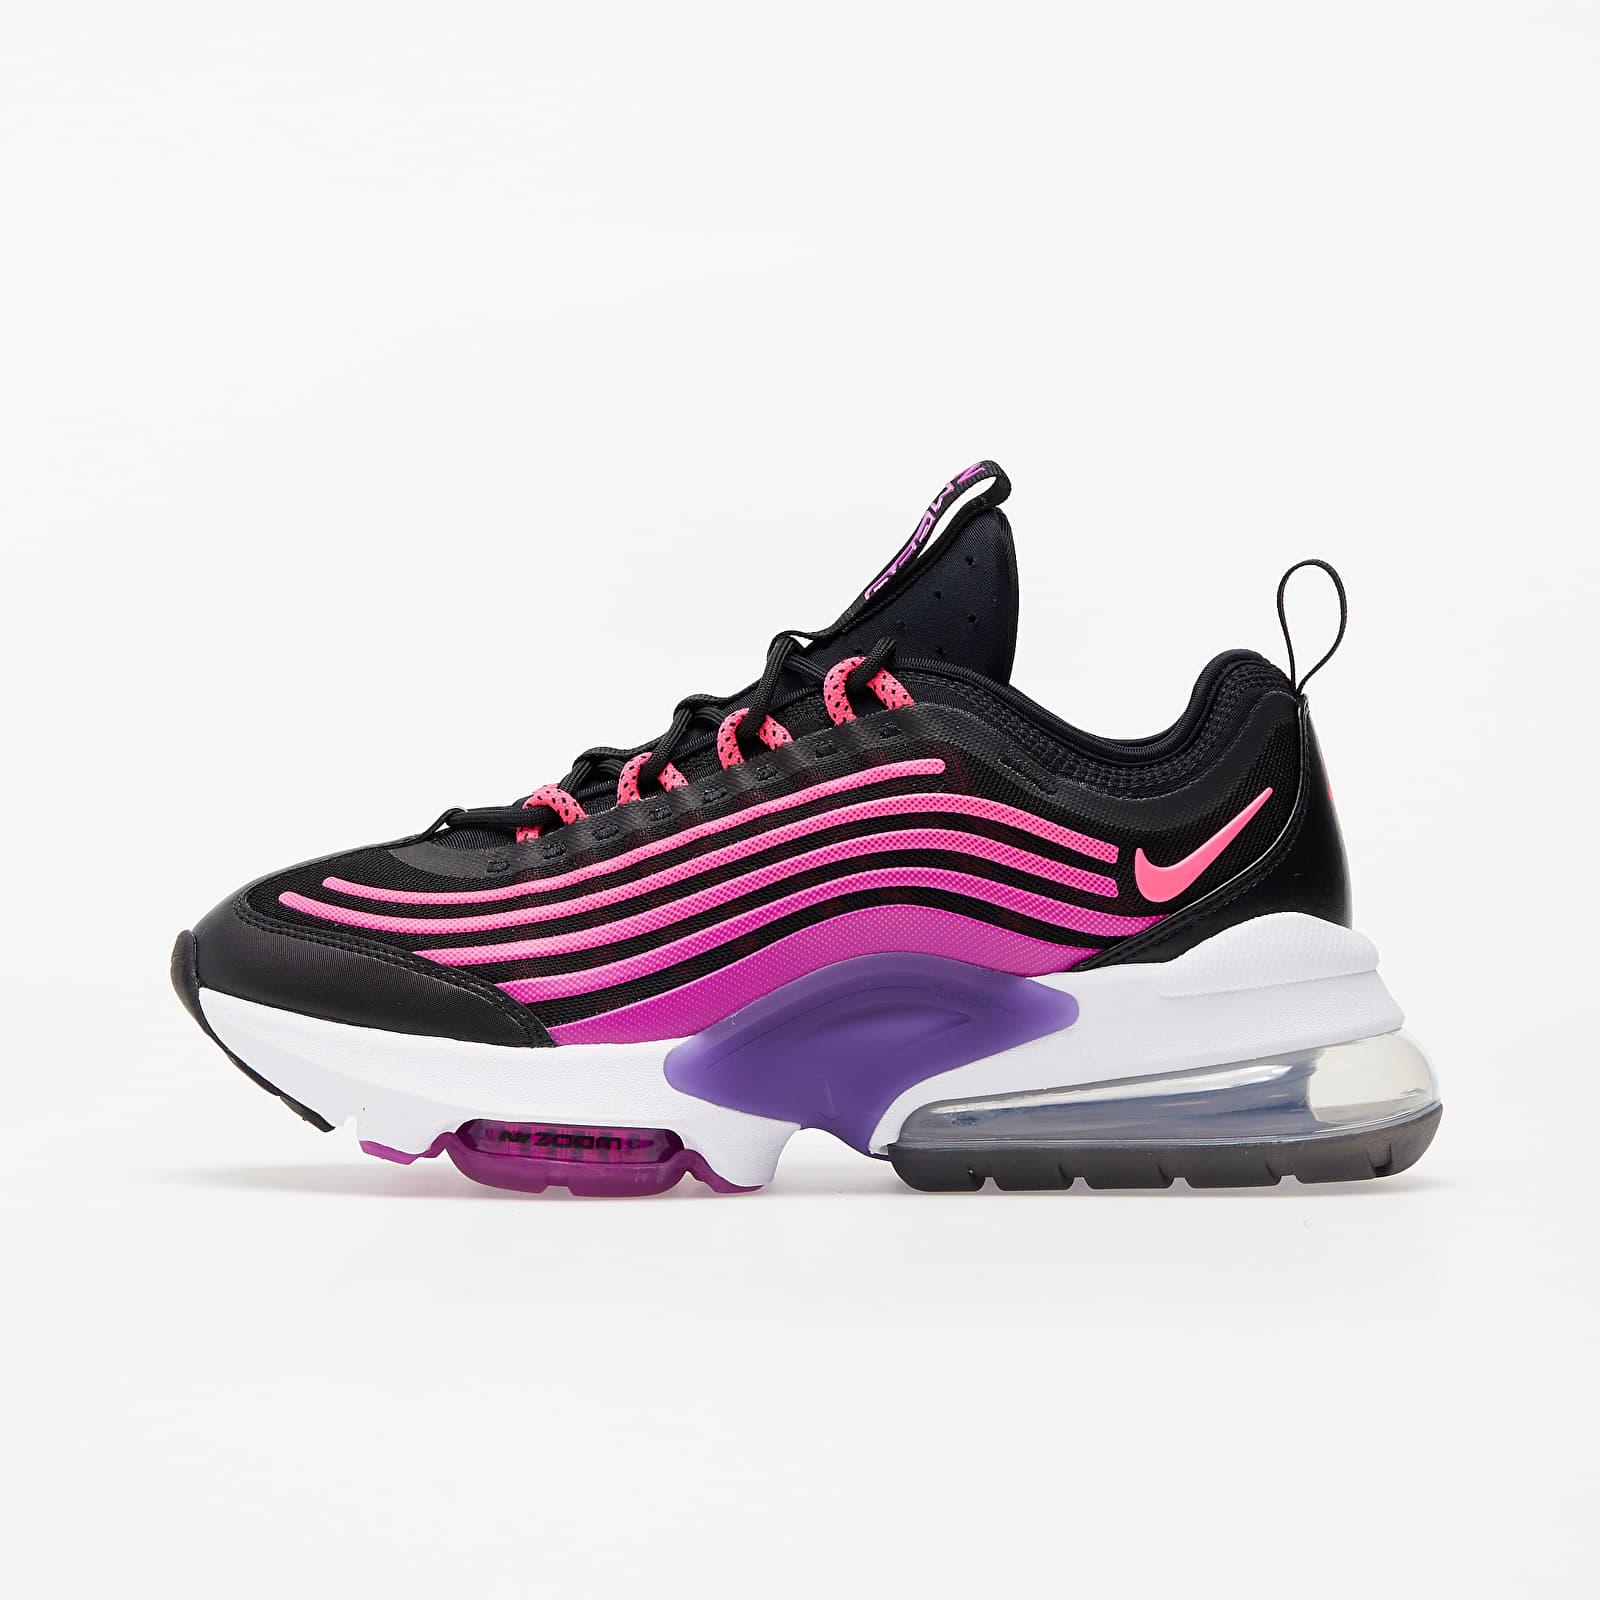 Dámské tenisky a boty Nike W Air Max ZM950 Black/ Hyper Pink-Vivid Purple